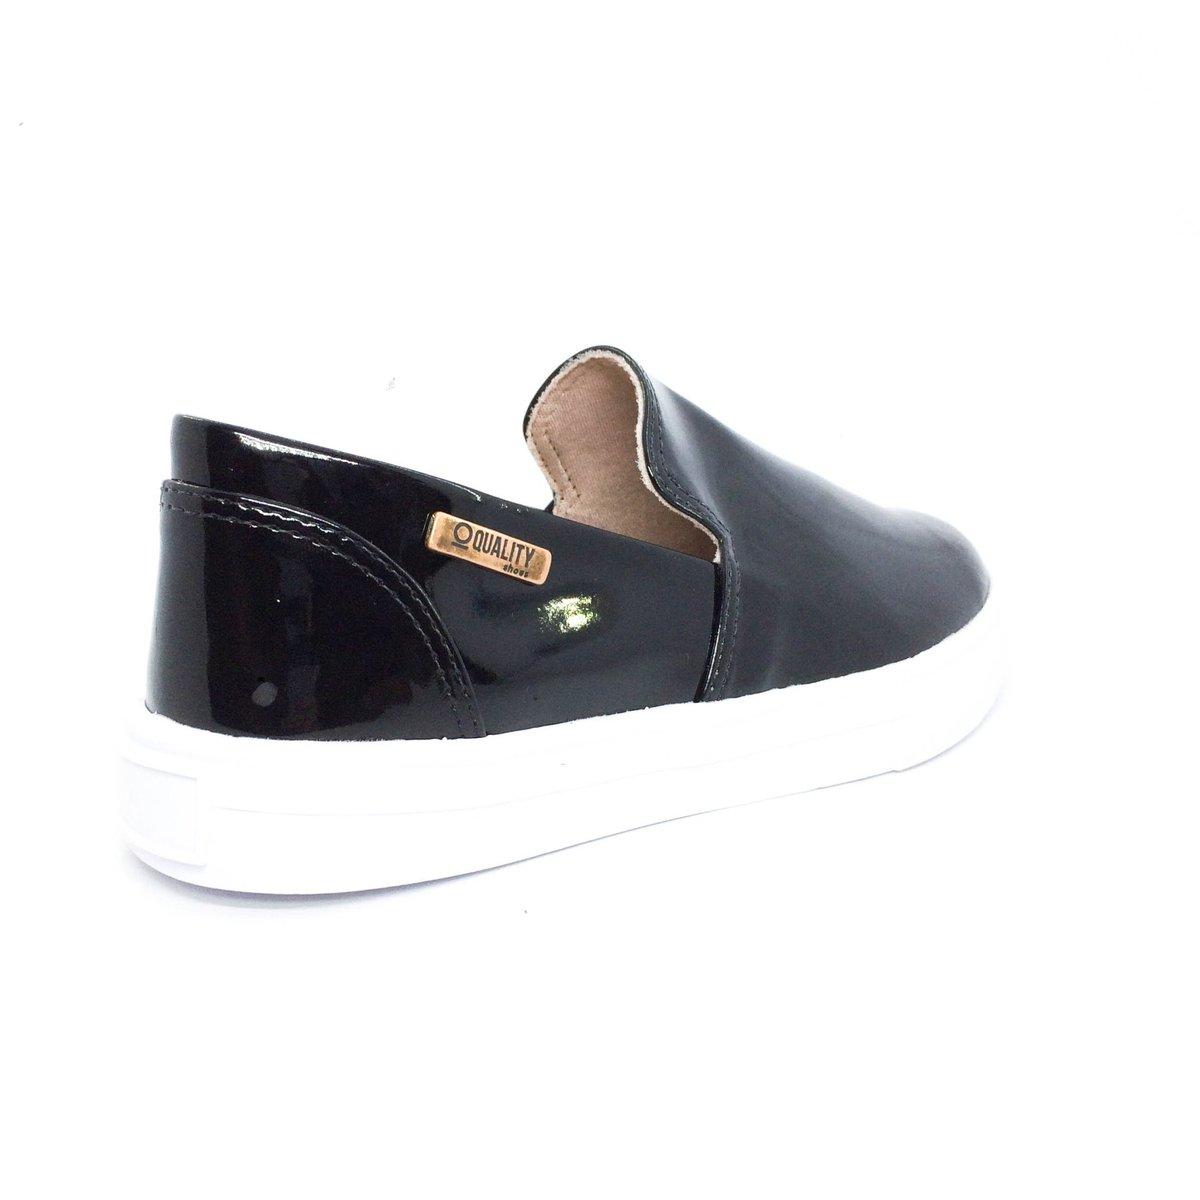 Verniz Tênis Feminino Tênis Slip Preto Shoes Slip Quality On On Quality qZT8Z7S